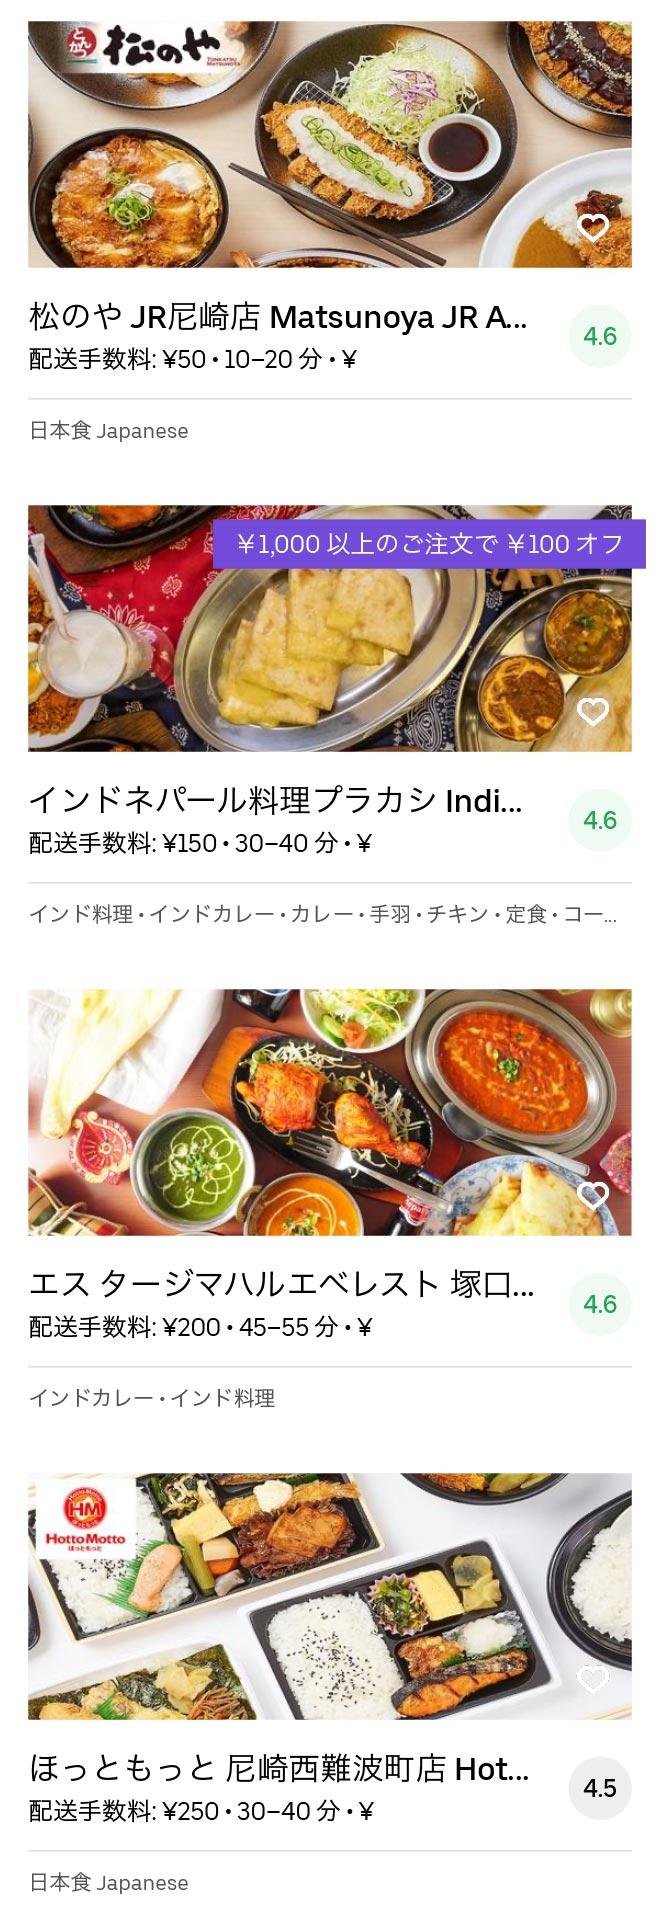 Amagasaki menu 2005 04